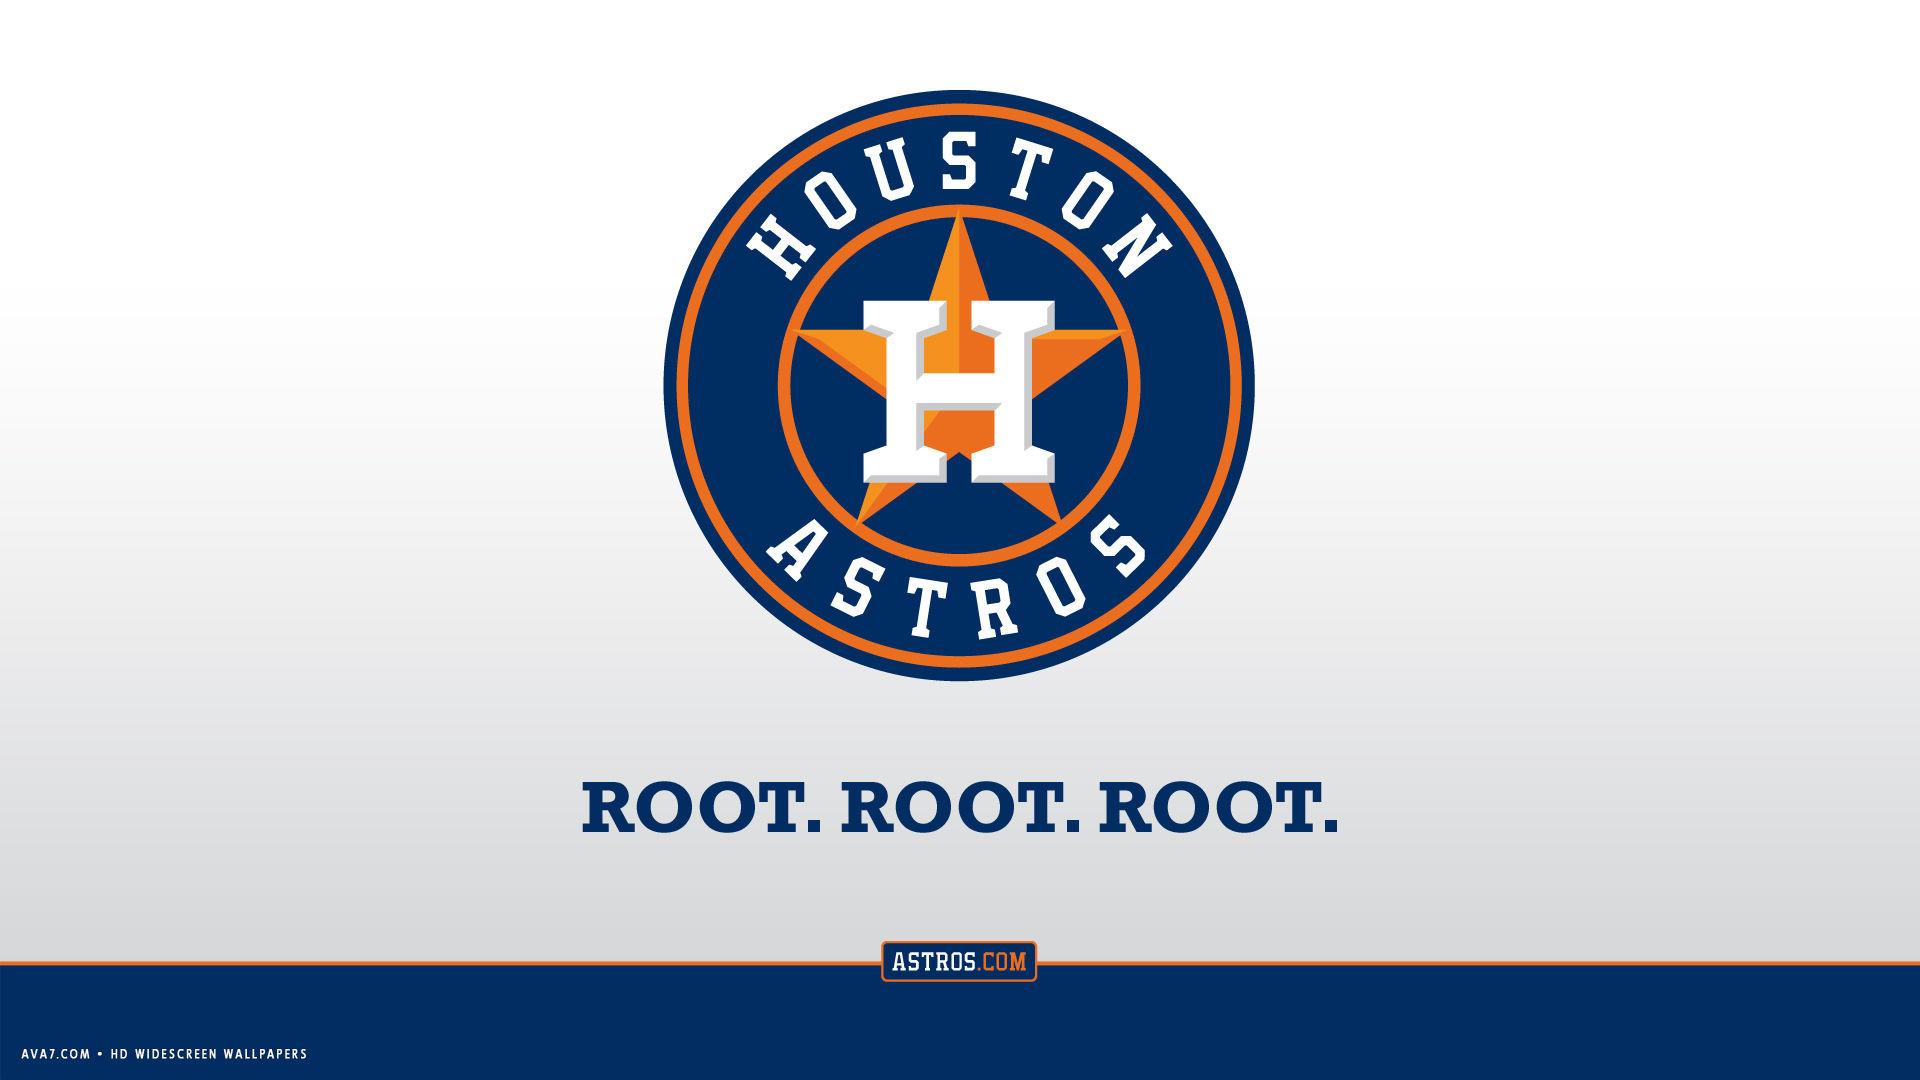 Astros Symbol >> Houston Astros Iphone Wallpaper 79 Images